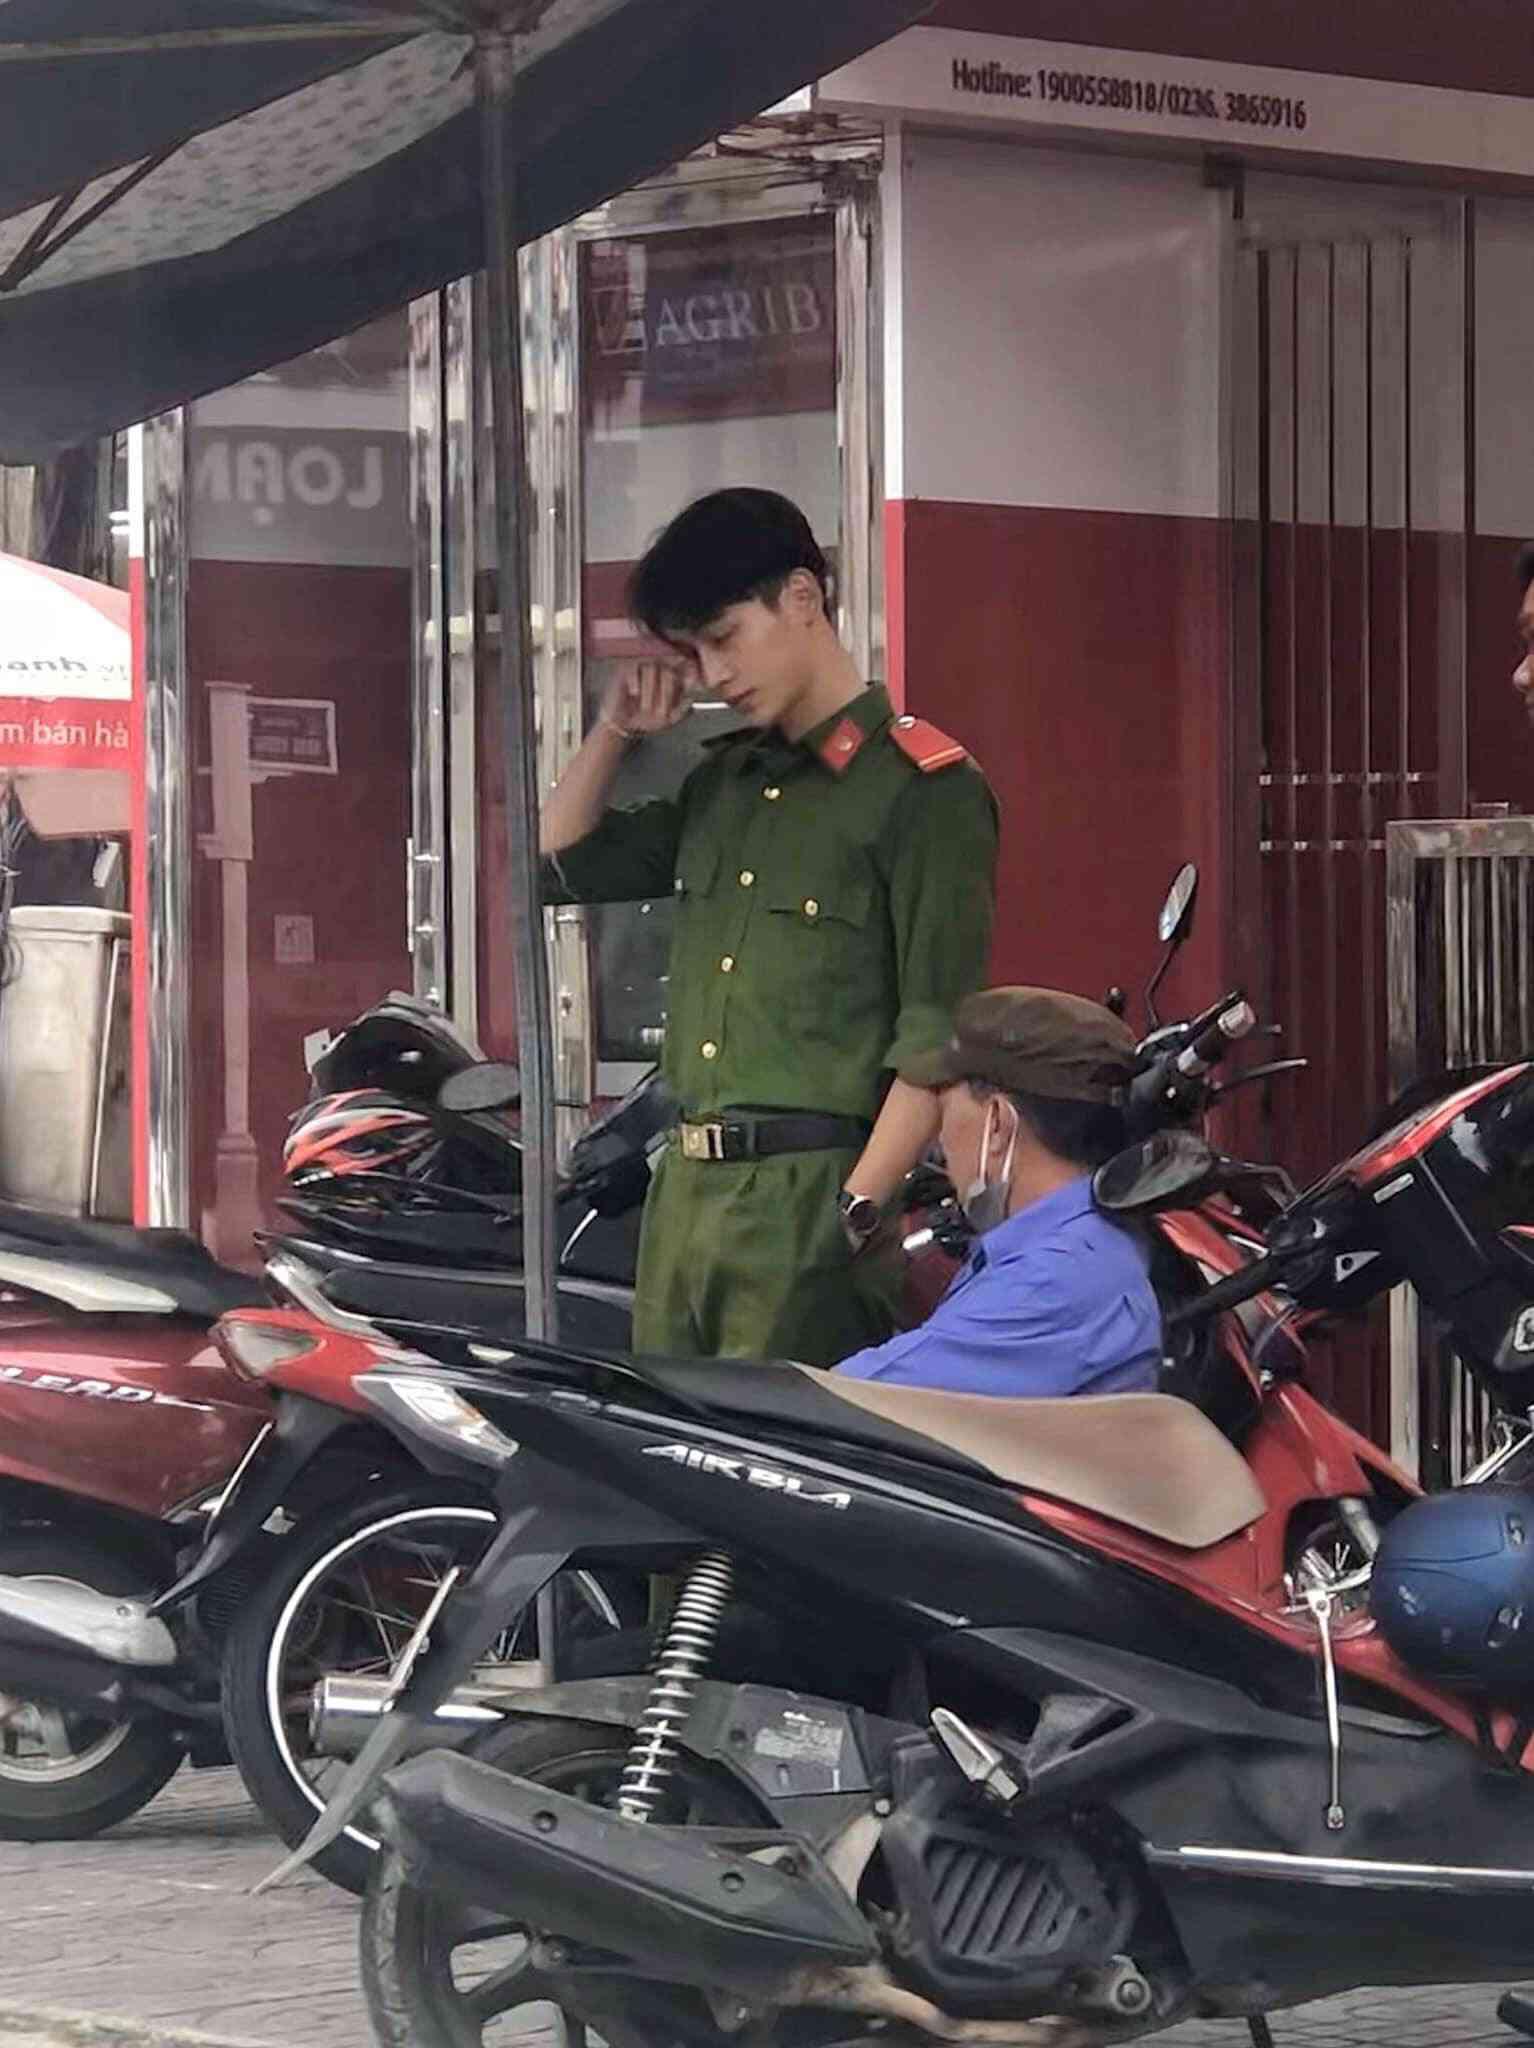 chang cong an so huu goc nghieng cuc pham va chuyen tinh lang man hon ca phim han quoc - 3